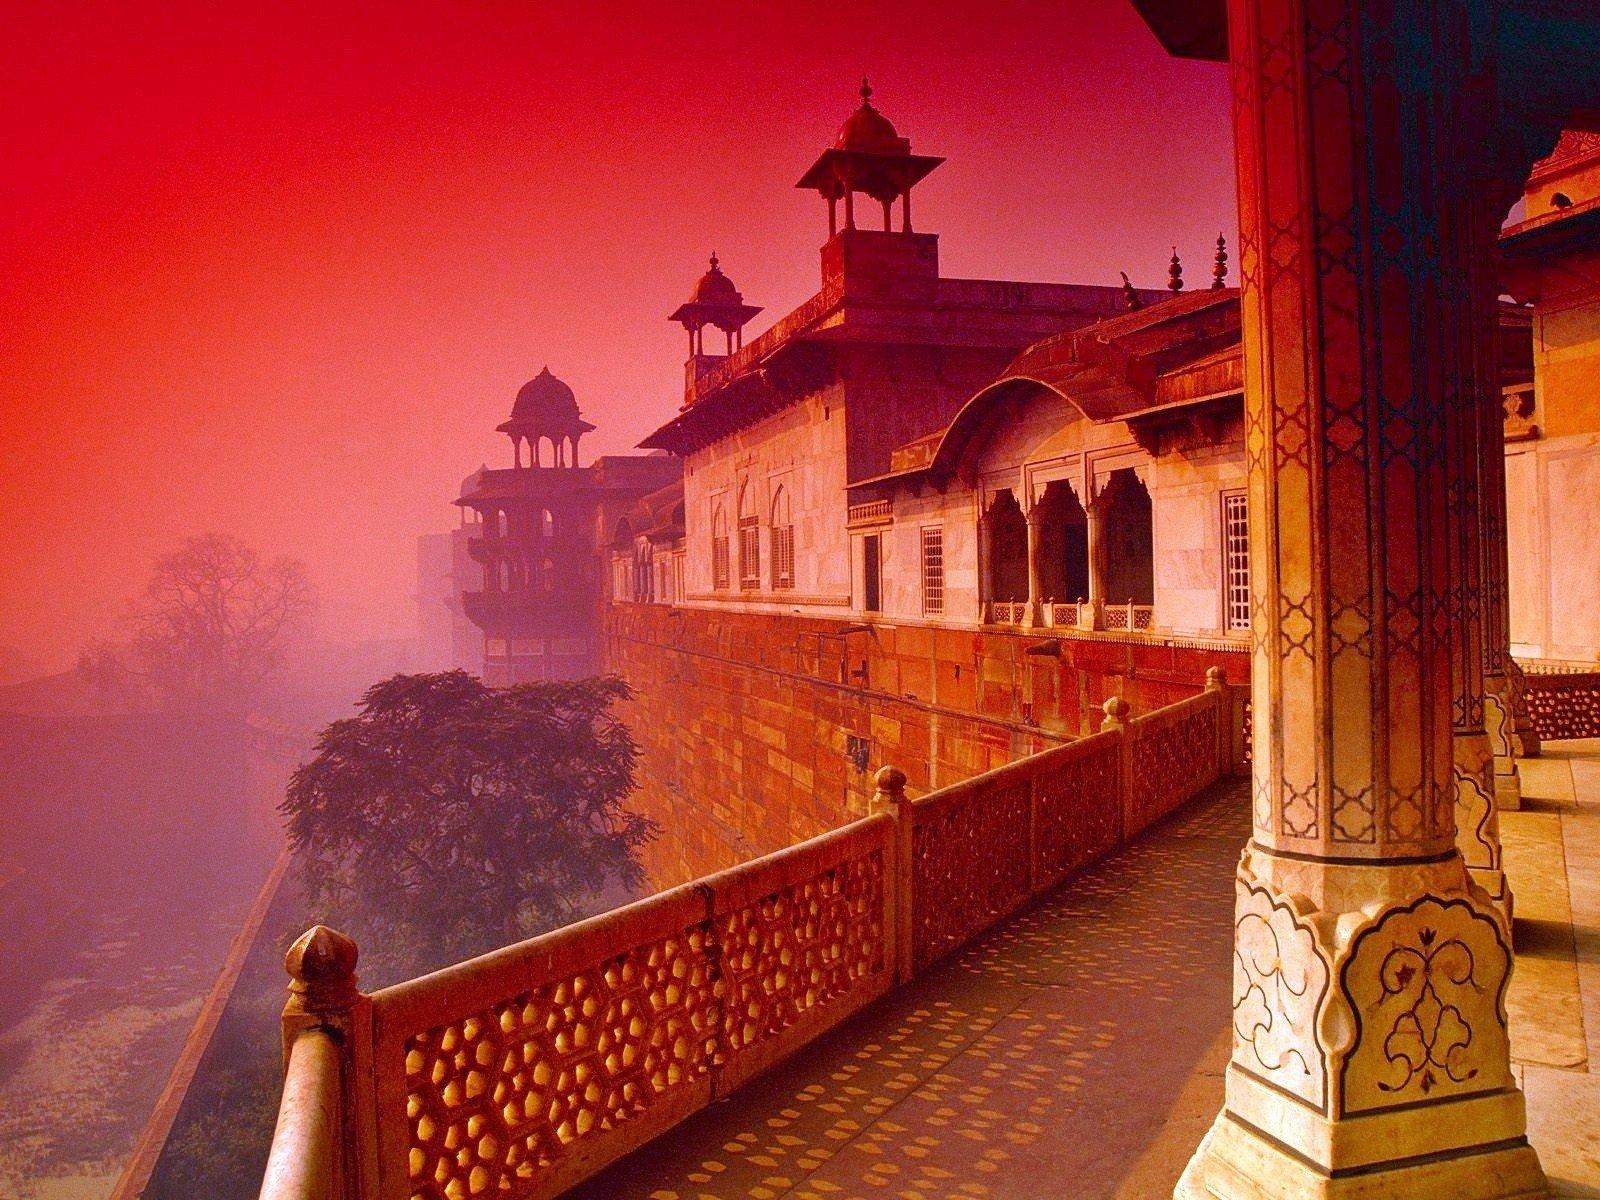 Castles India Fort wallpaper | 1600x1200 | 234405 | WallpaperUP